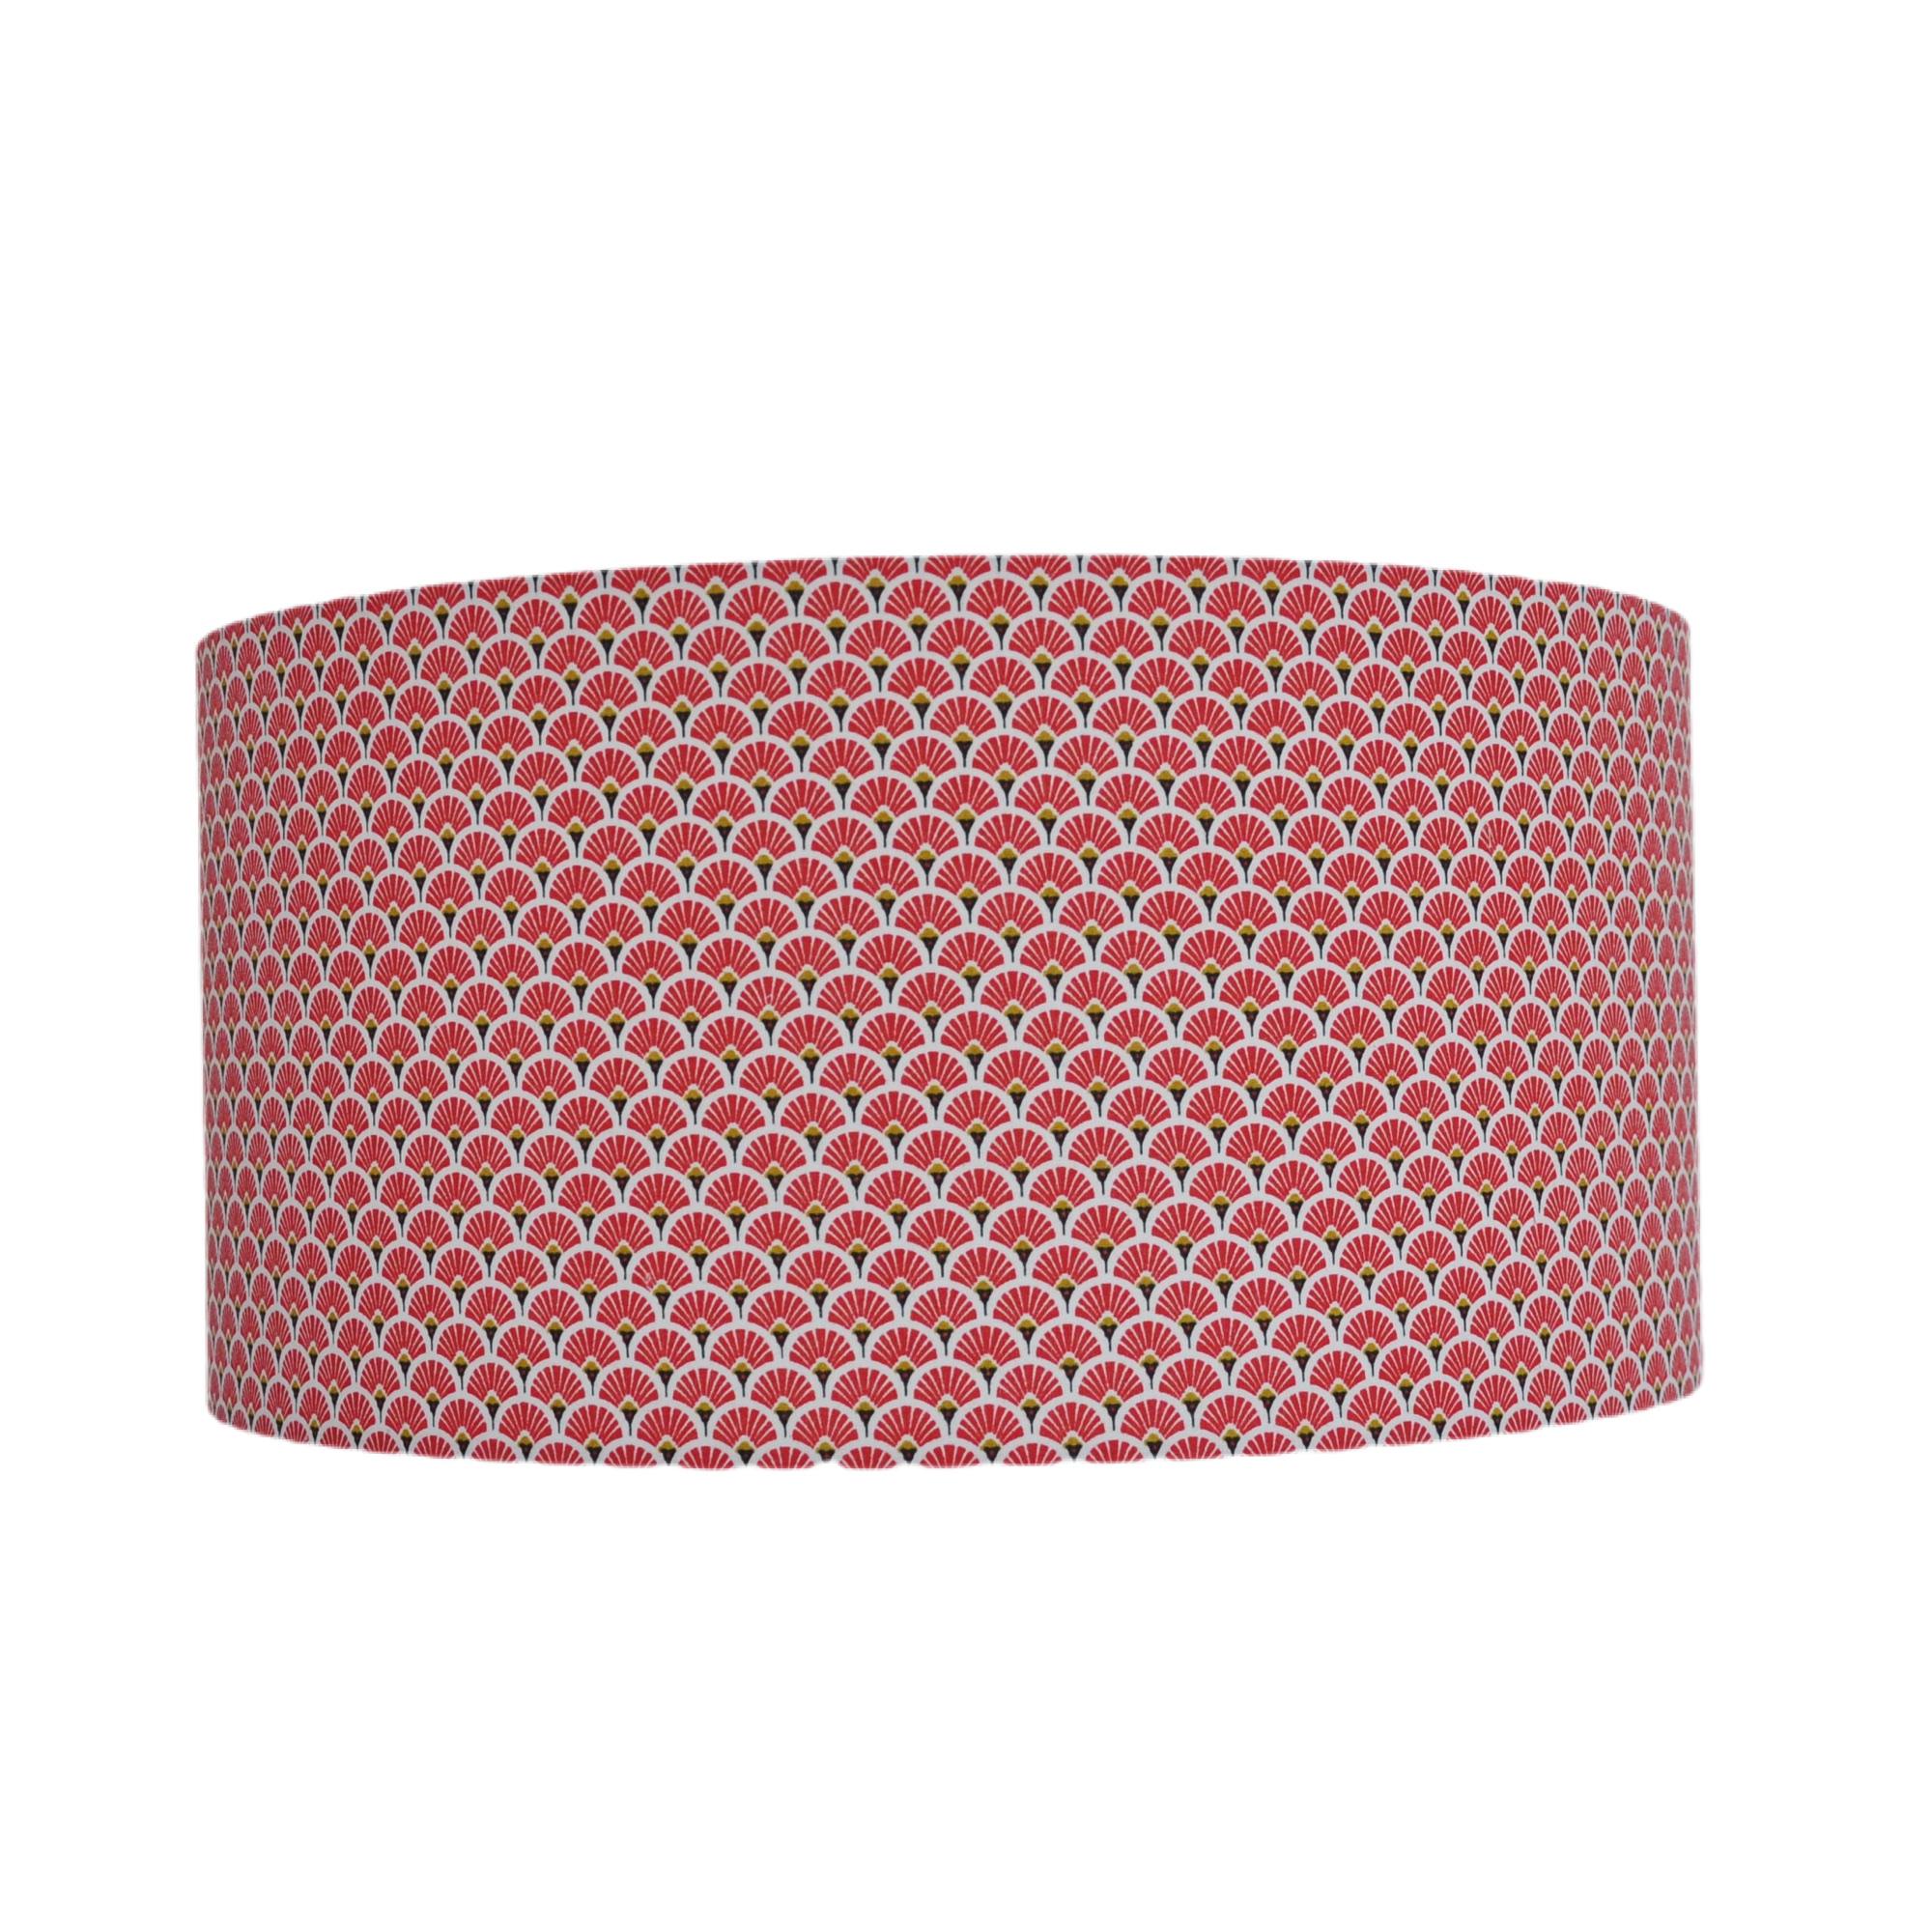 Suspension eventail rouge et or diamètre 40 cm